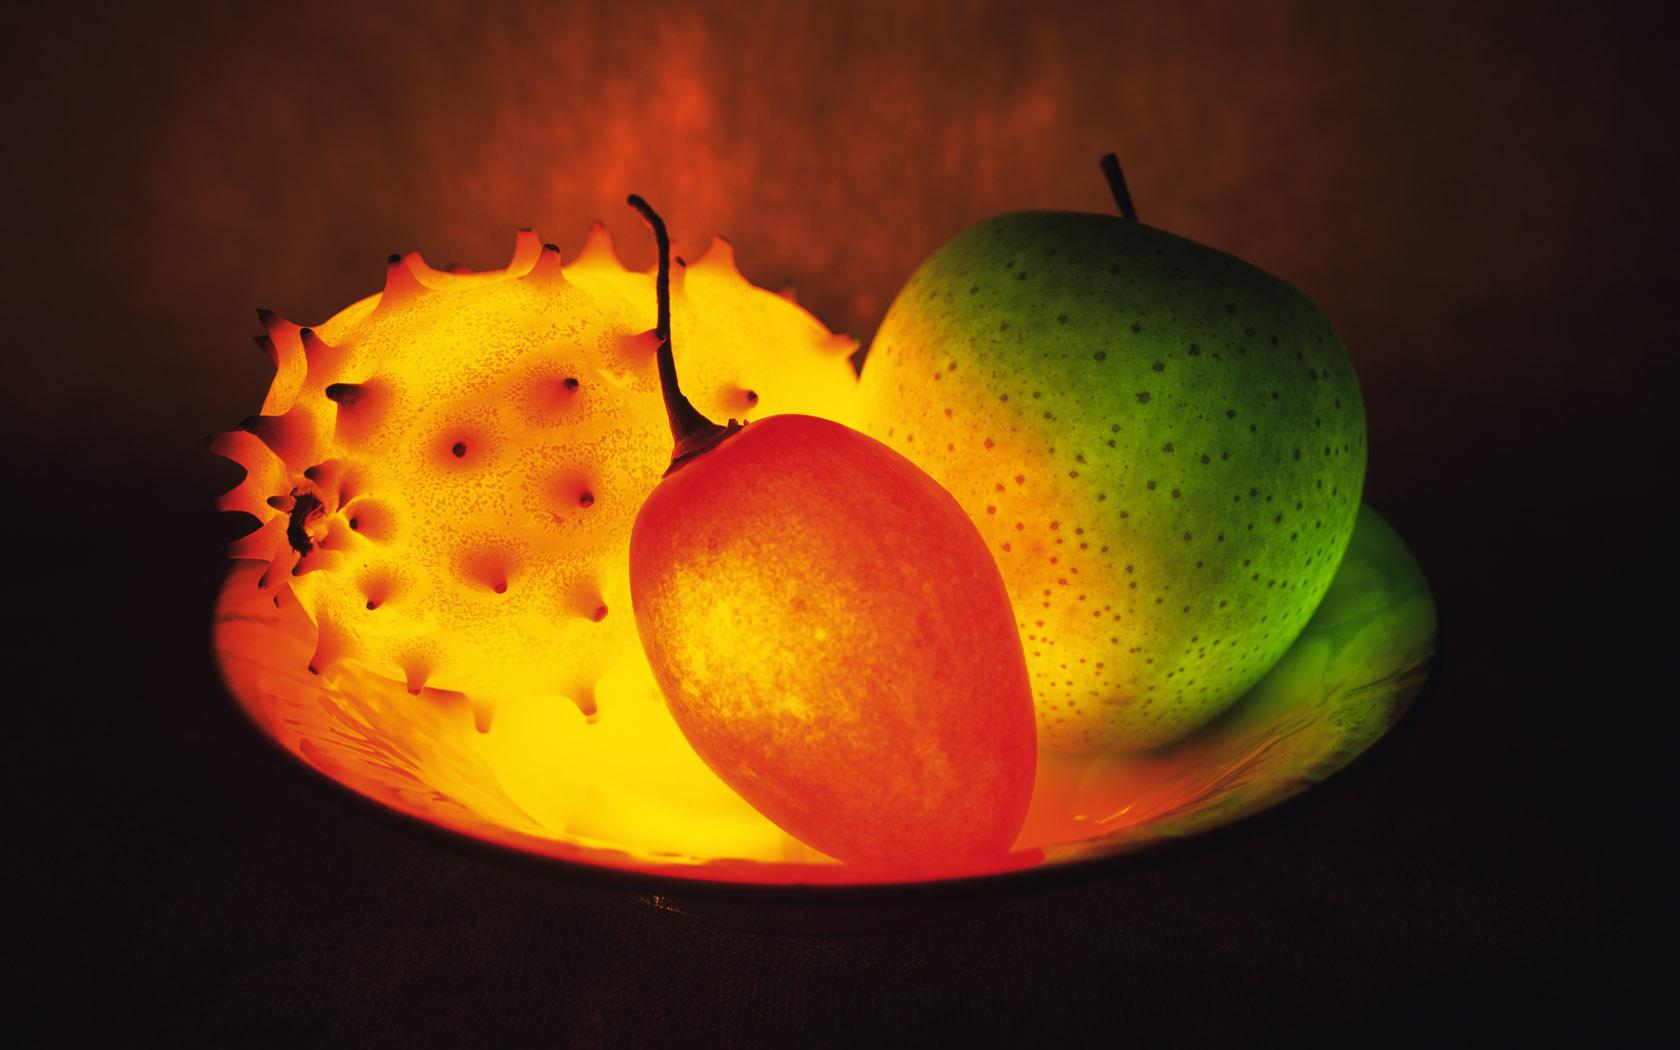 apple fruit photos wallpaper 1680x1050